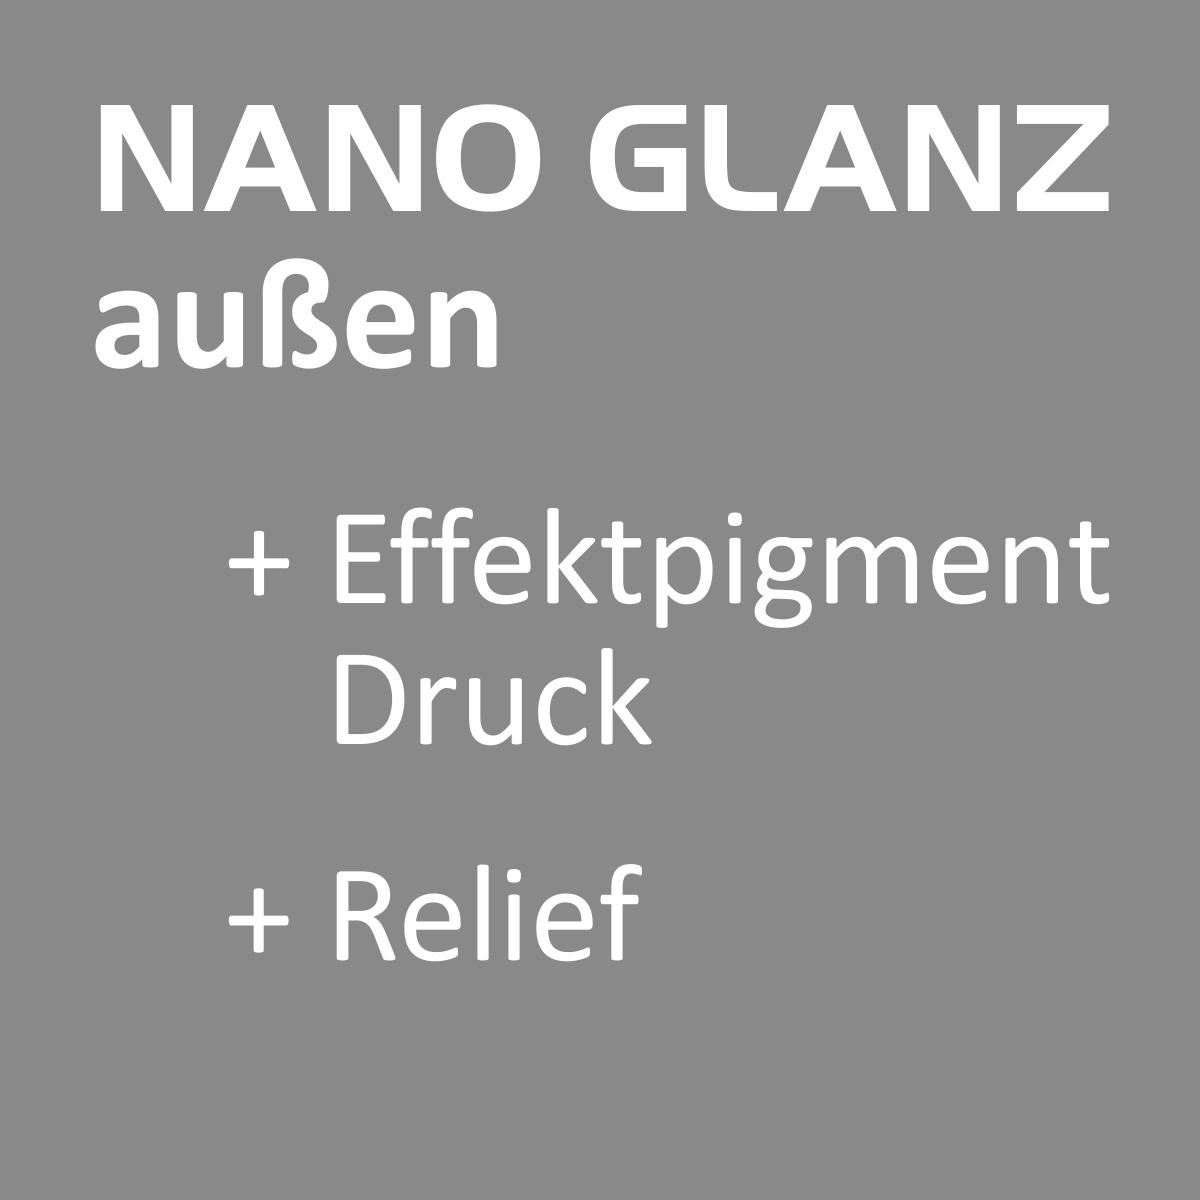 Nano Glanz_3 Text